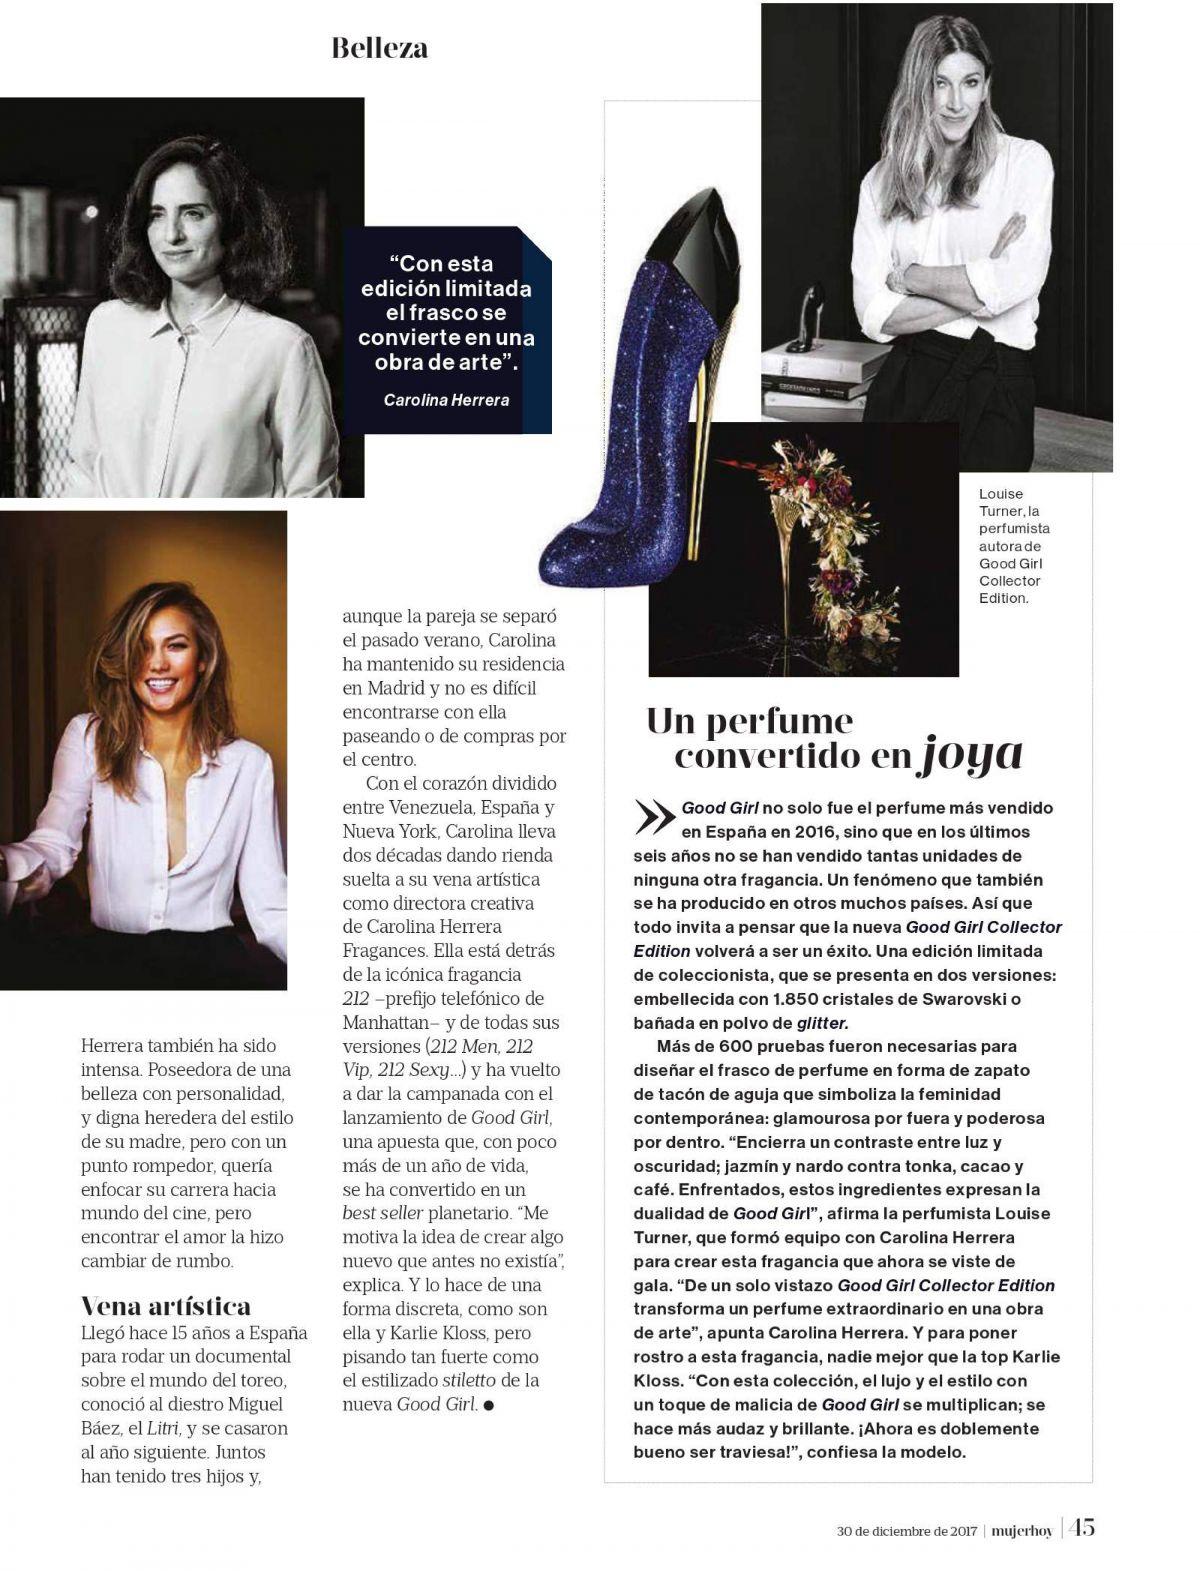 80d607411283 KARLIE KLOSS and CAROLINA HERRERA in Mujer Hoy Magazine, December ...